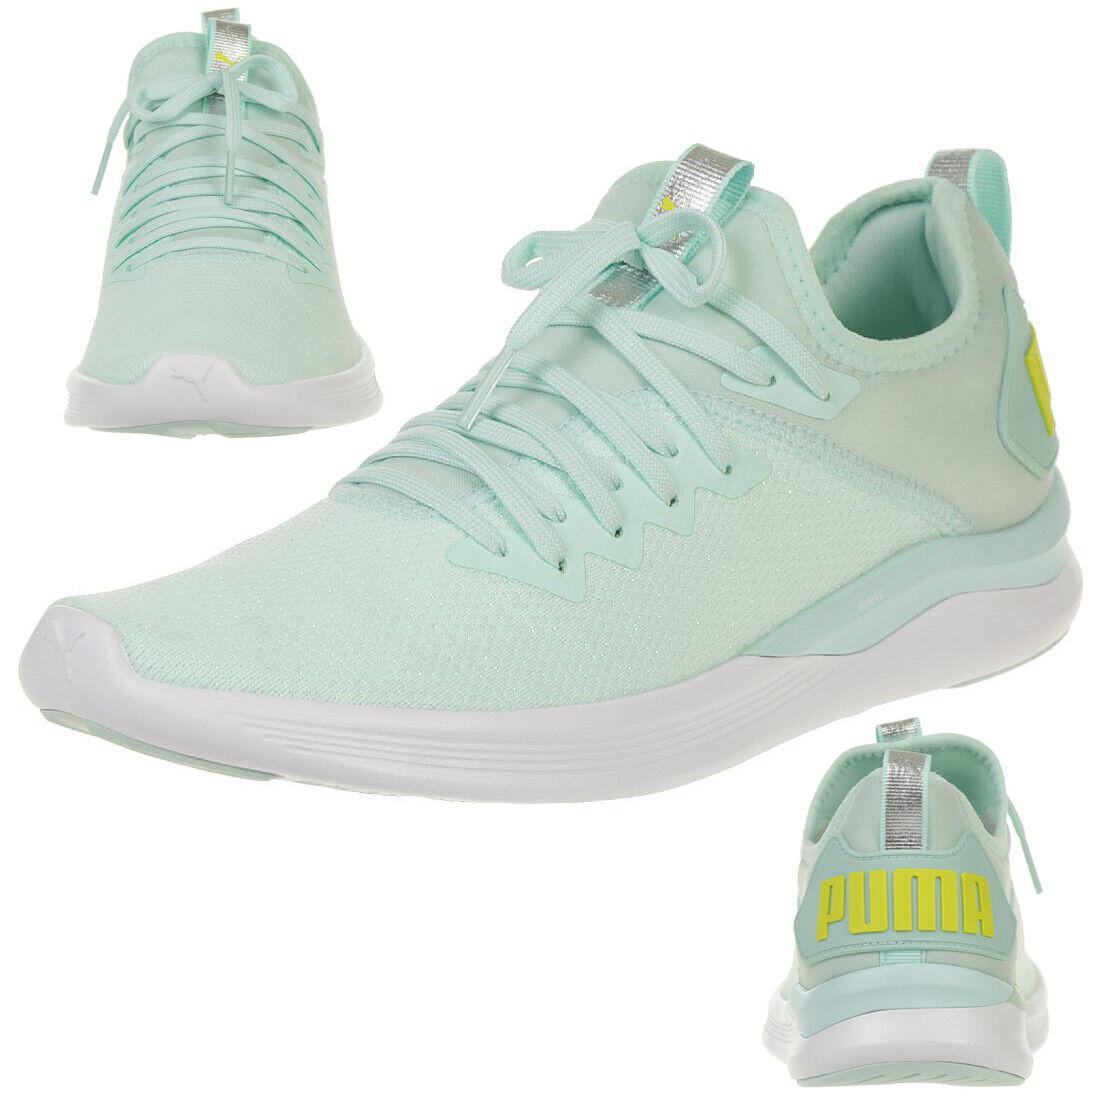 Puma Ignite Flash evoknit SR Jogging Chaussures Femmes Fitness Chaussures 192457 02